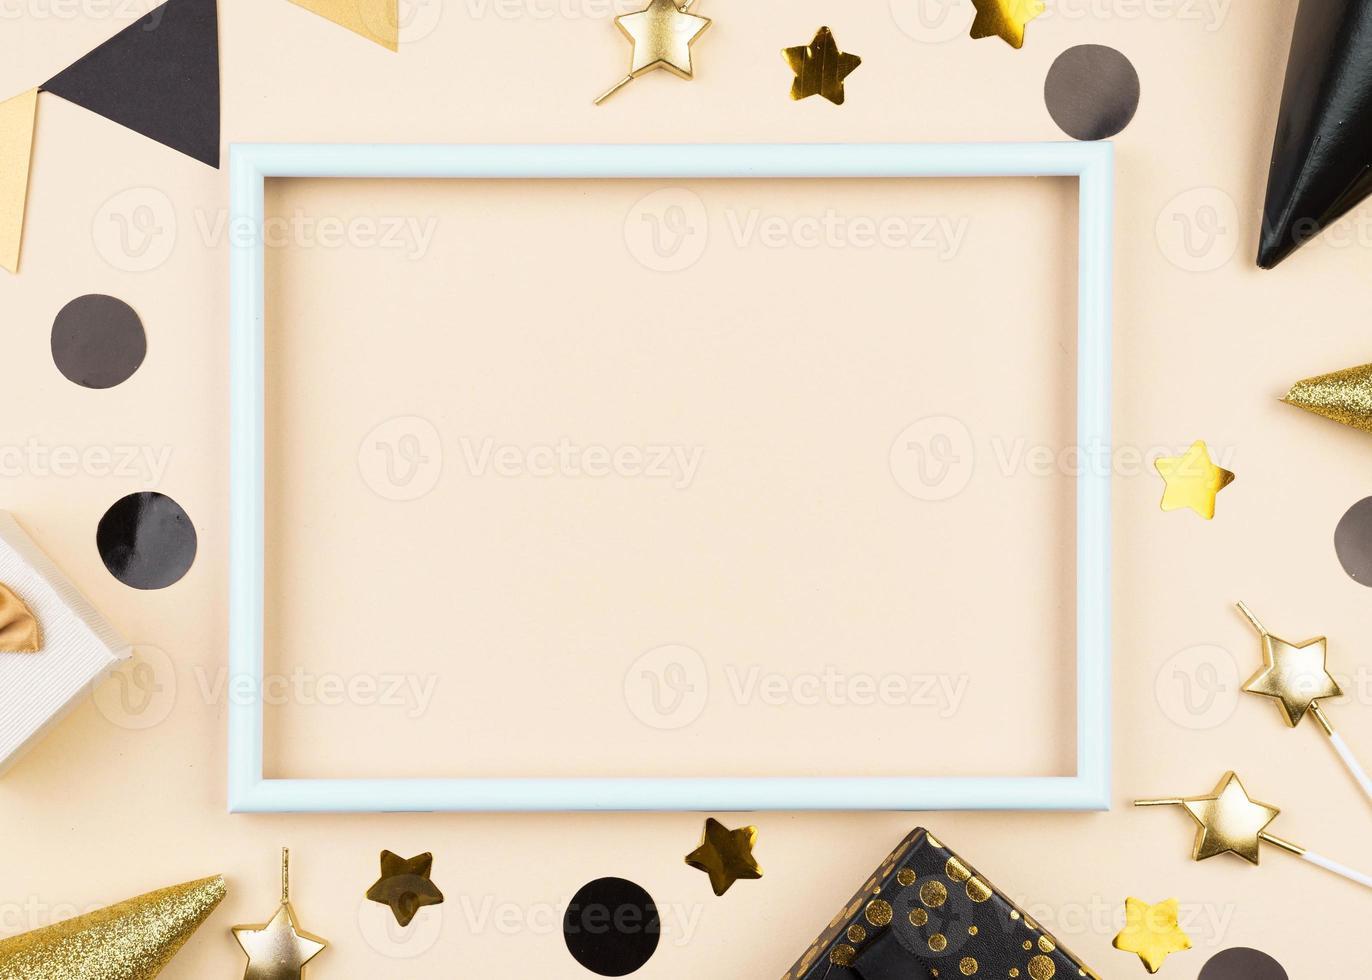 plat lag verjaardagsdecoraties met frame foto